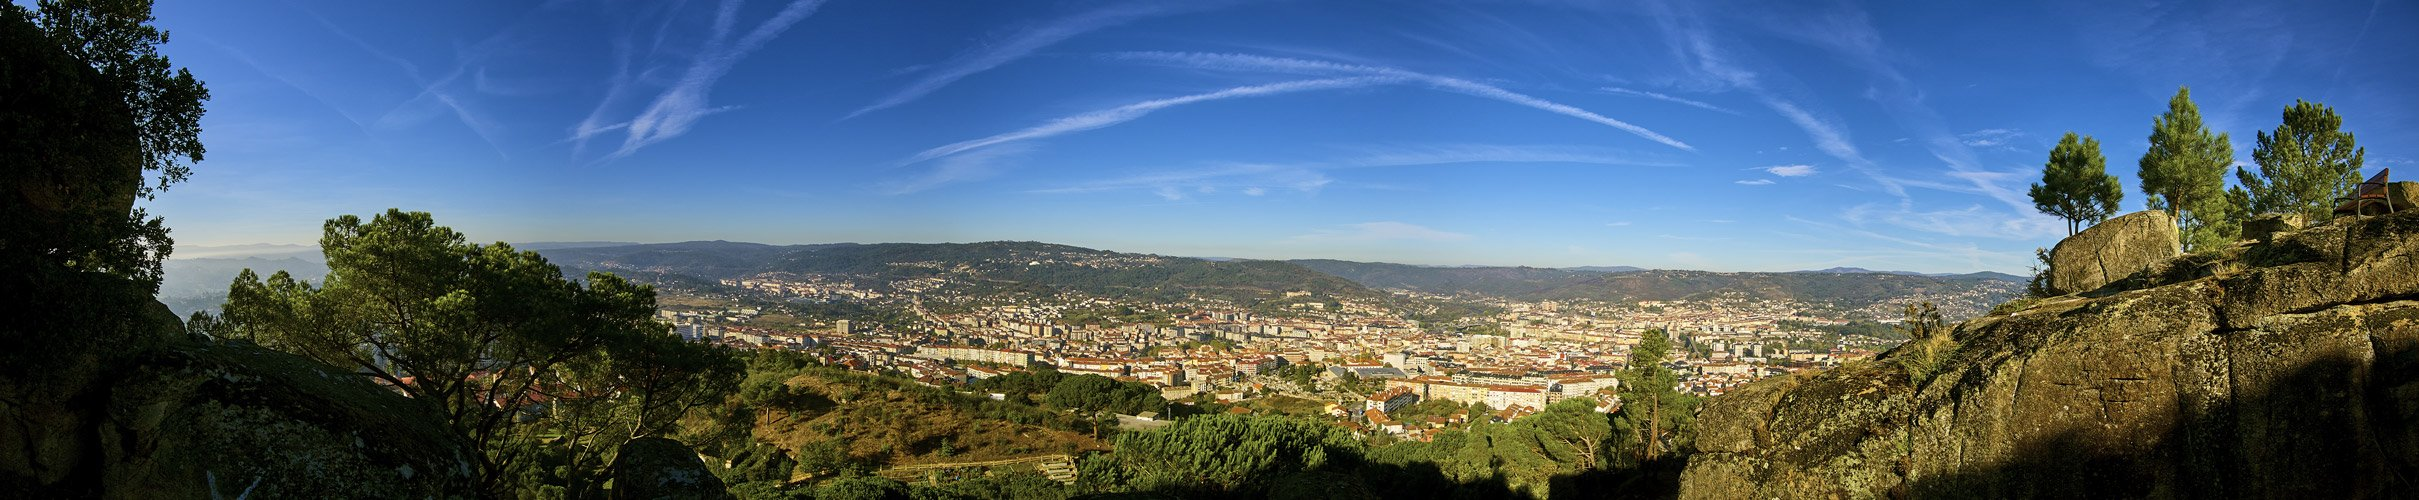 Monte Alegre - Ourense